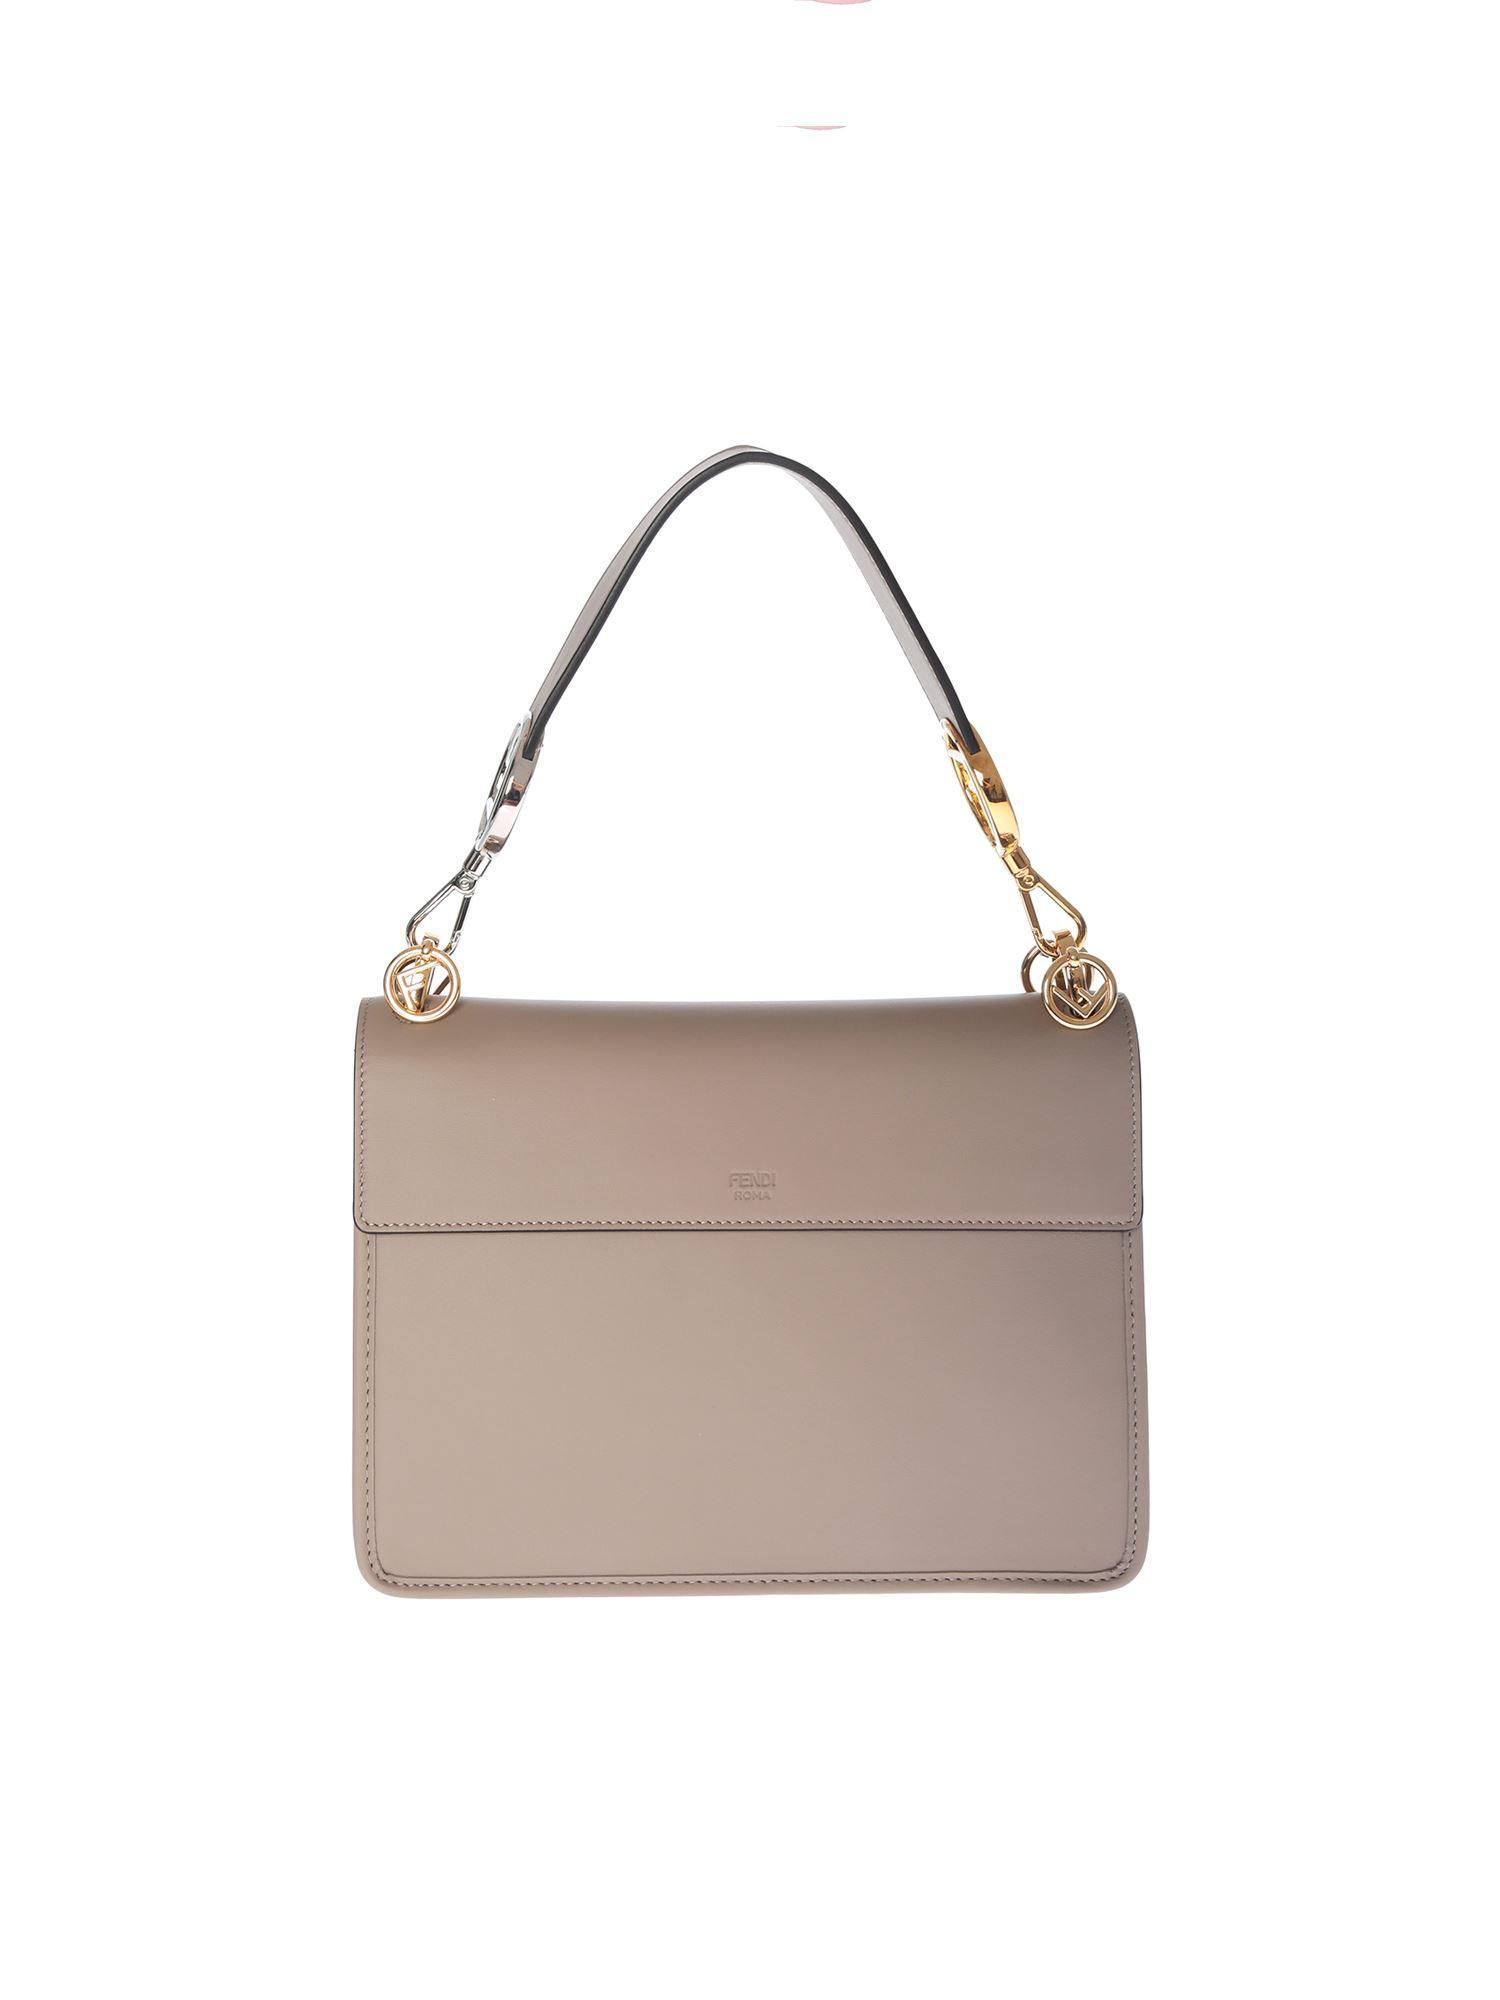 97cba22fbb Lyst - Fendi Taupe Color Kan I Bag